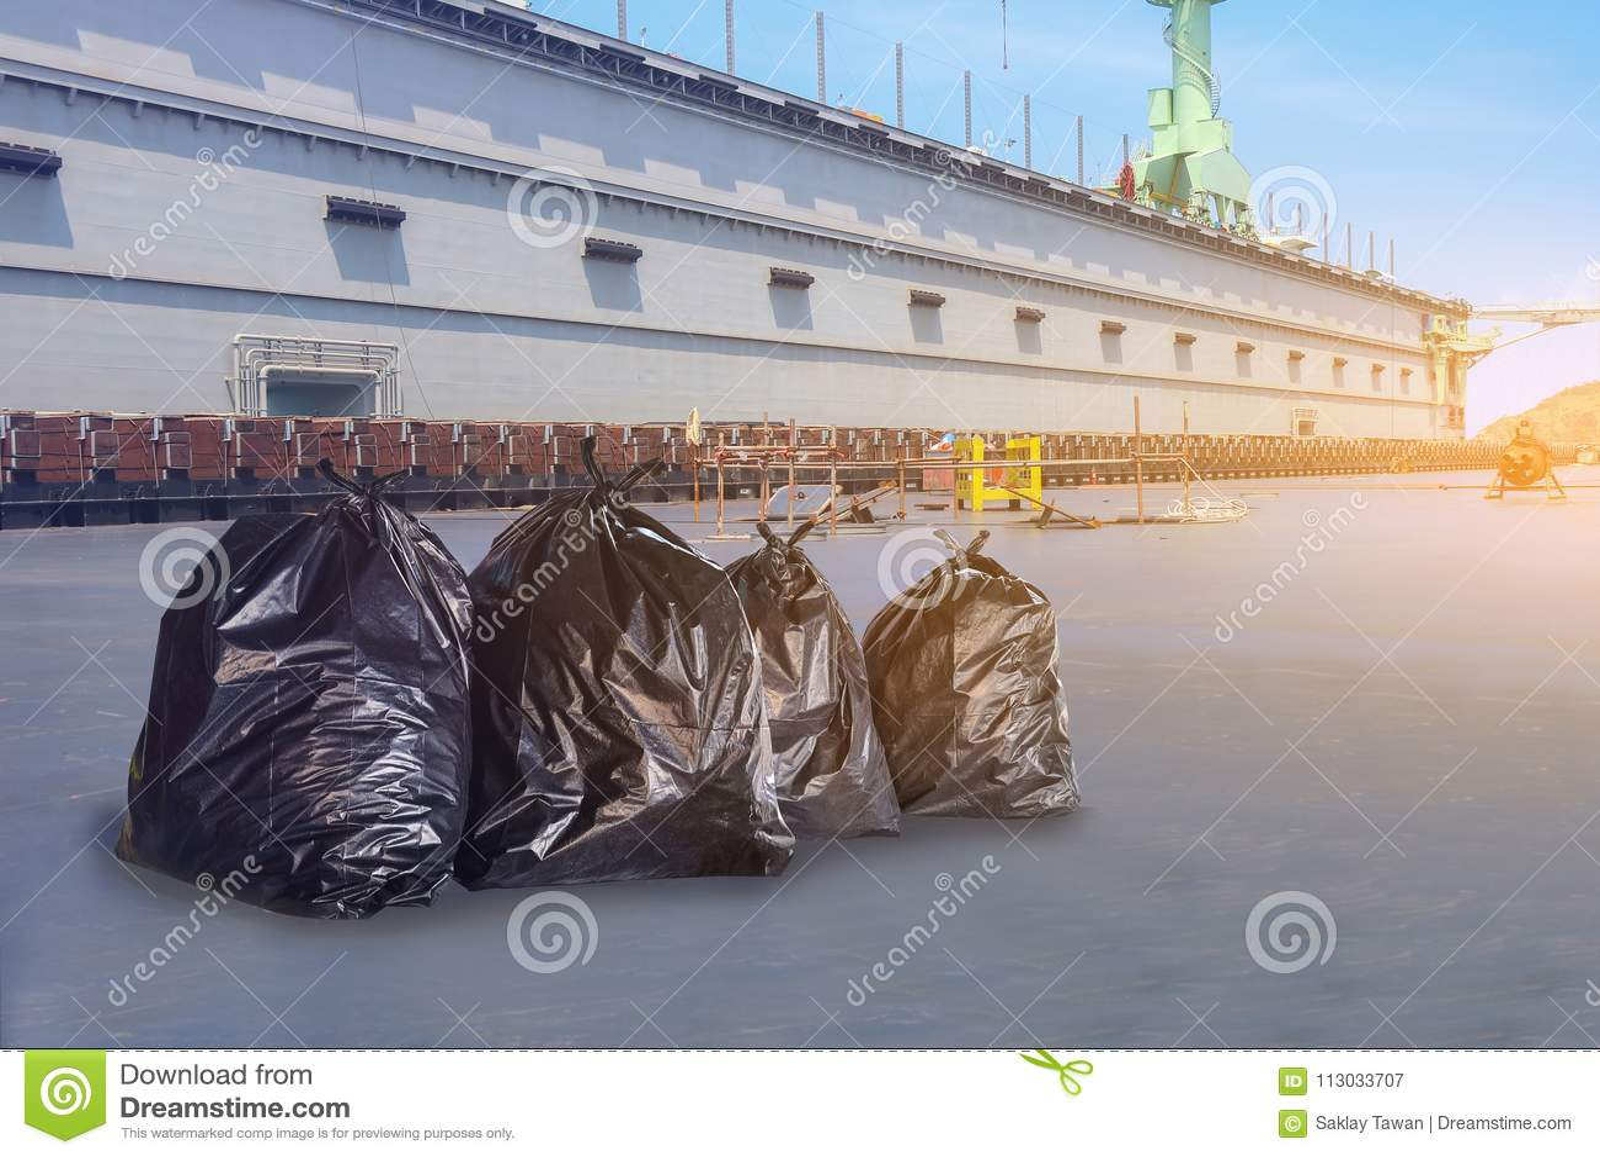 Basura negra del bolso de basura